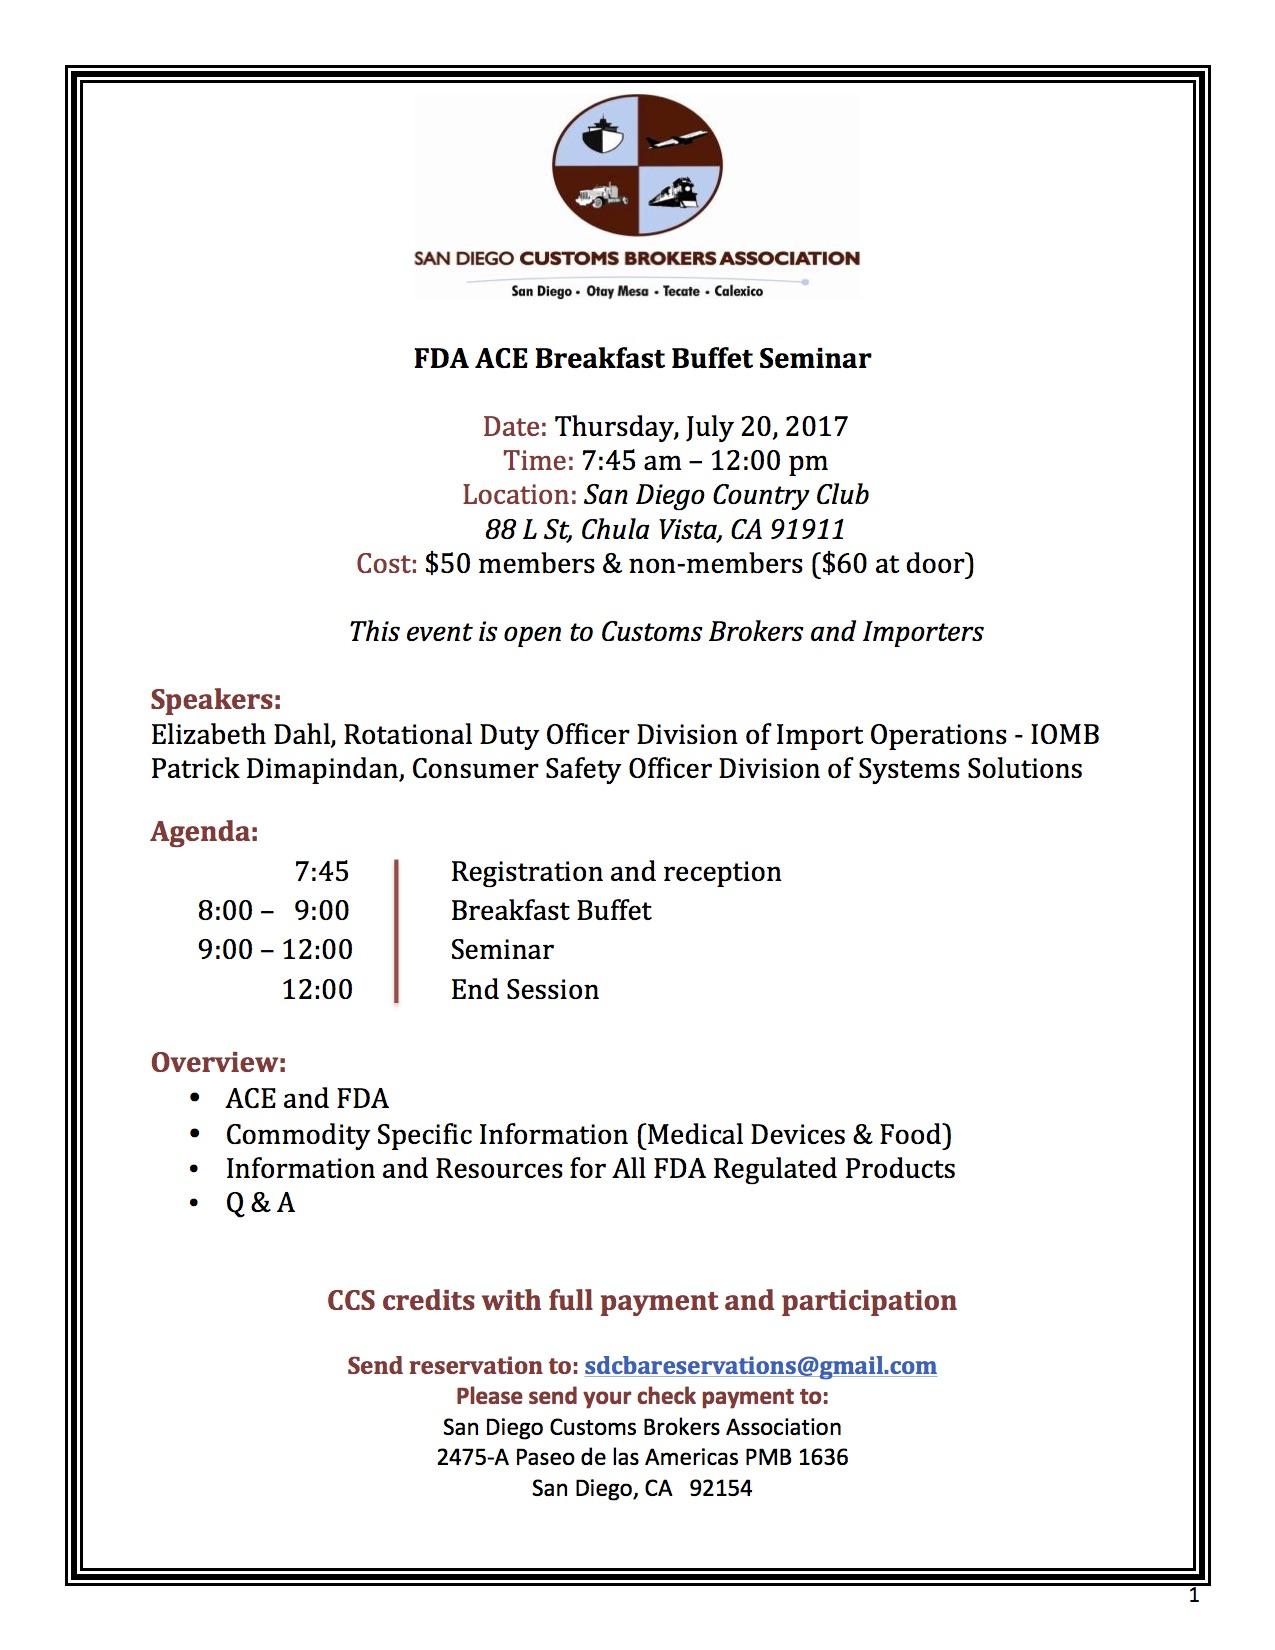 FDA ACE Seminar Flyer